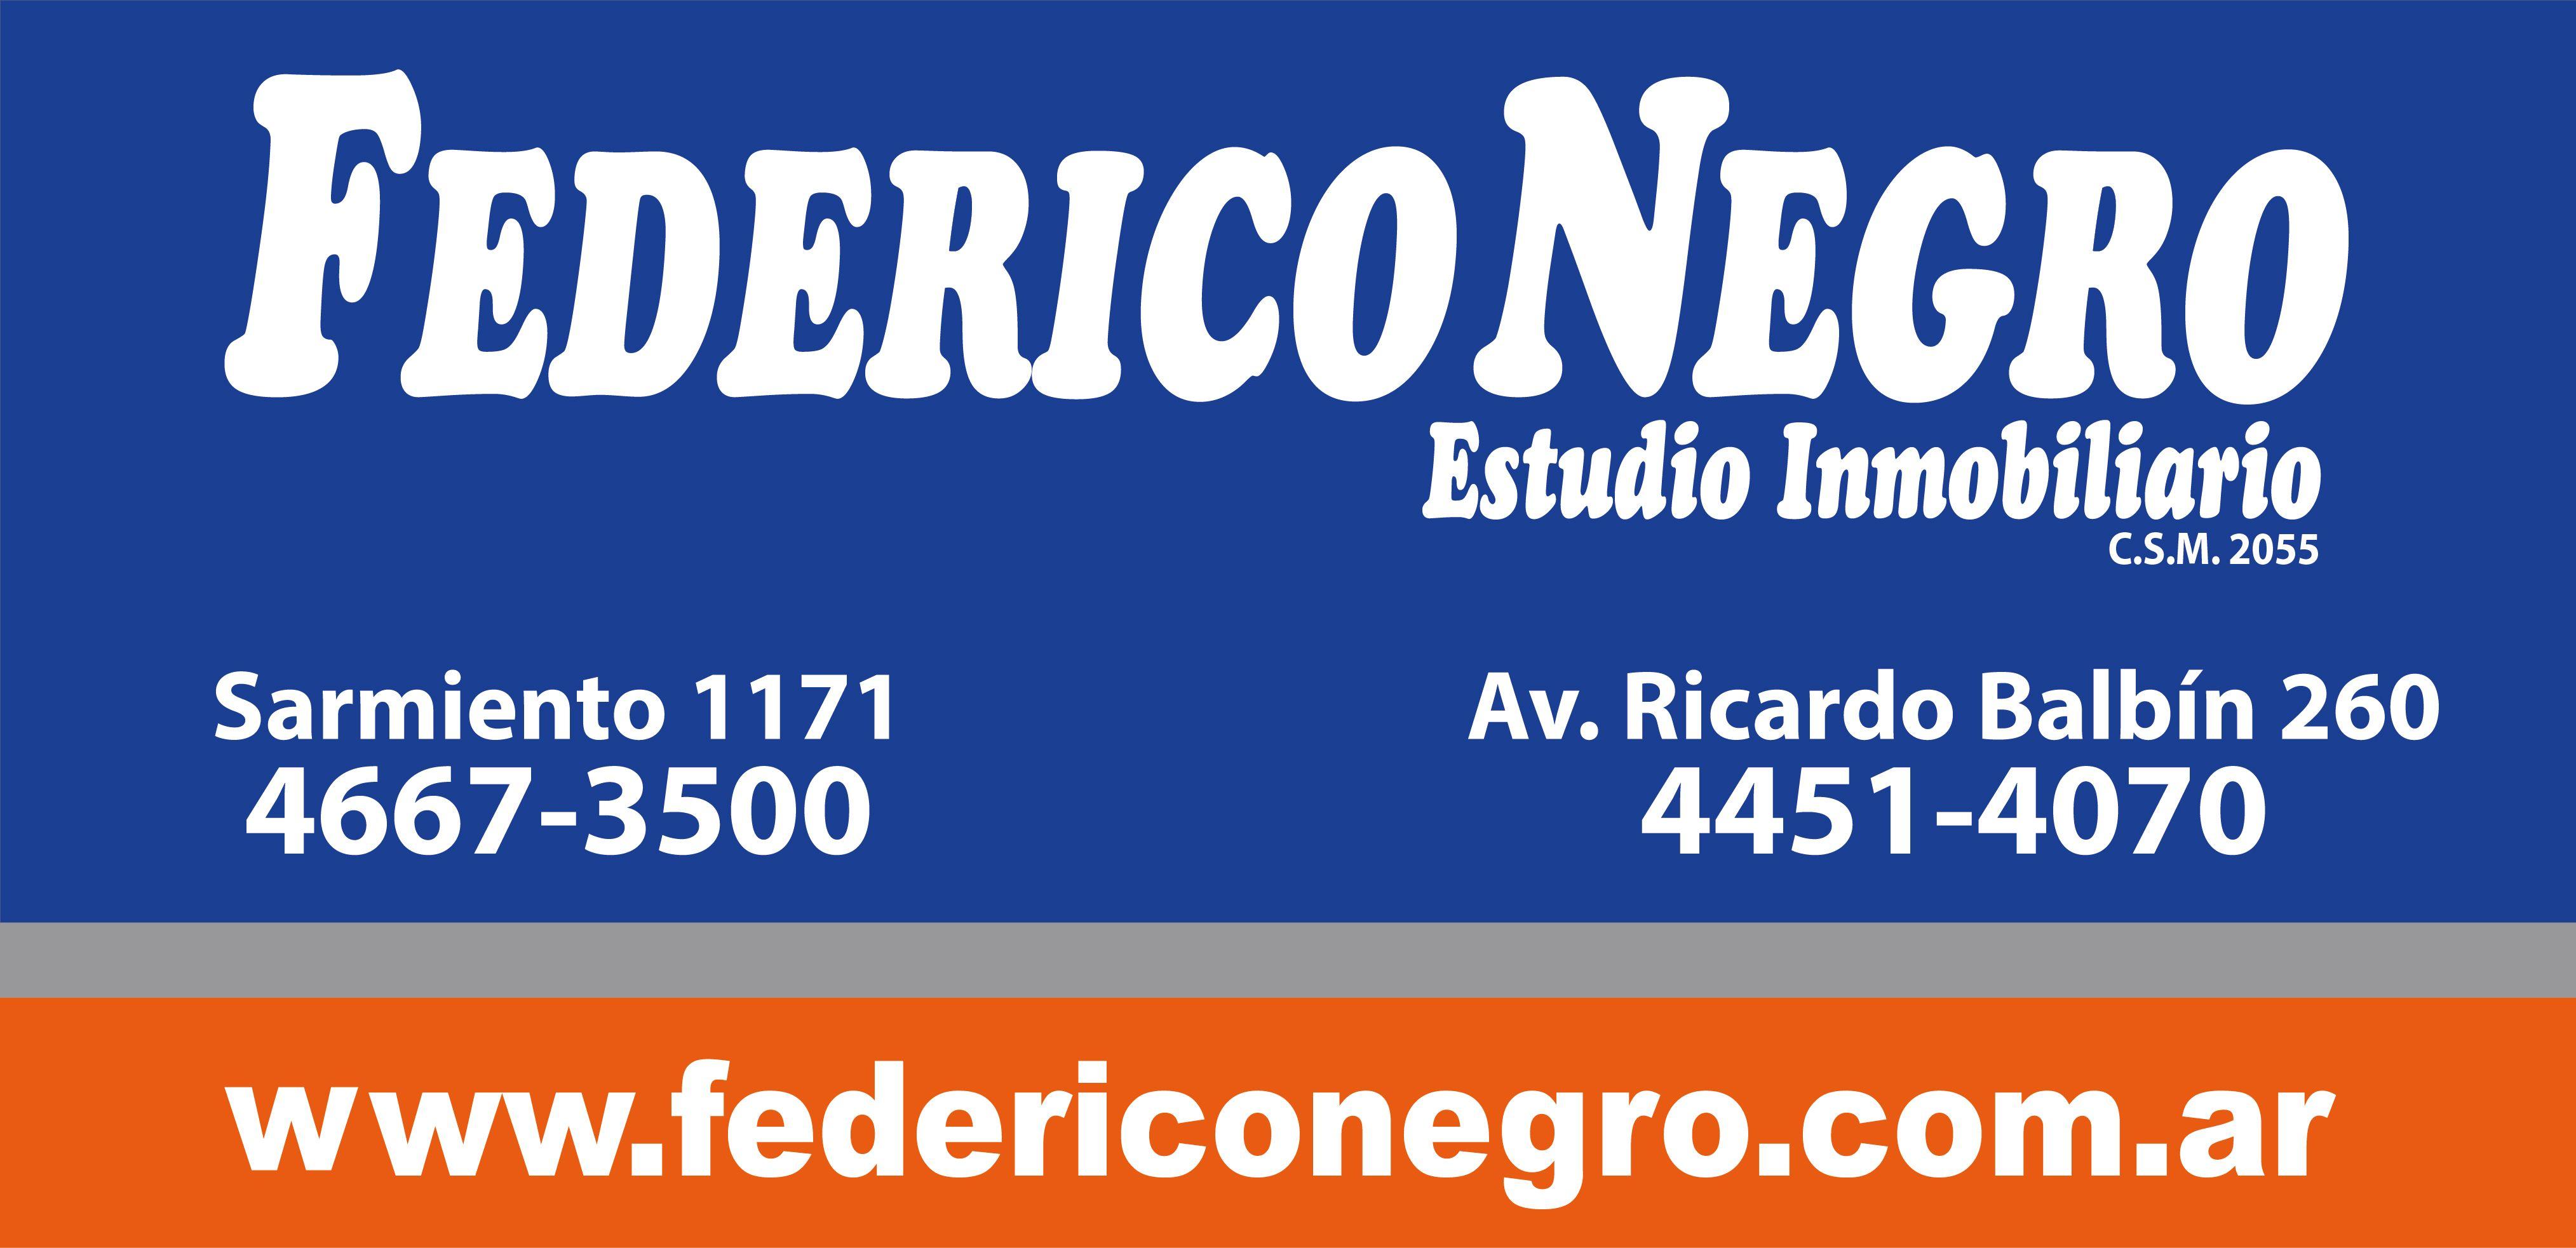 Logo de  Federico Negro Estudio Inmobiliario